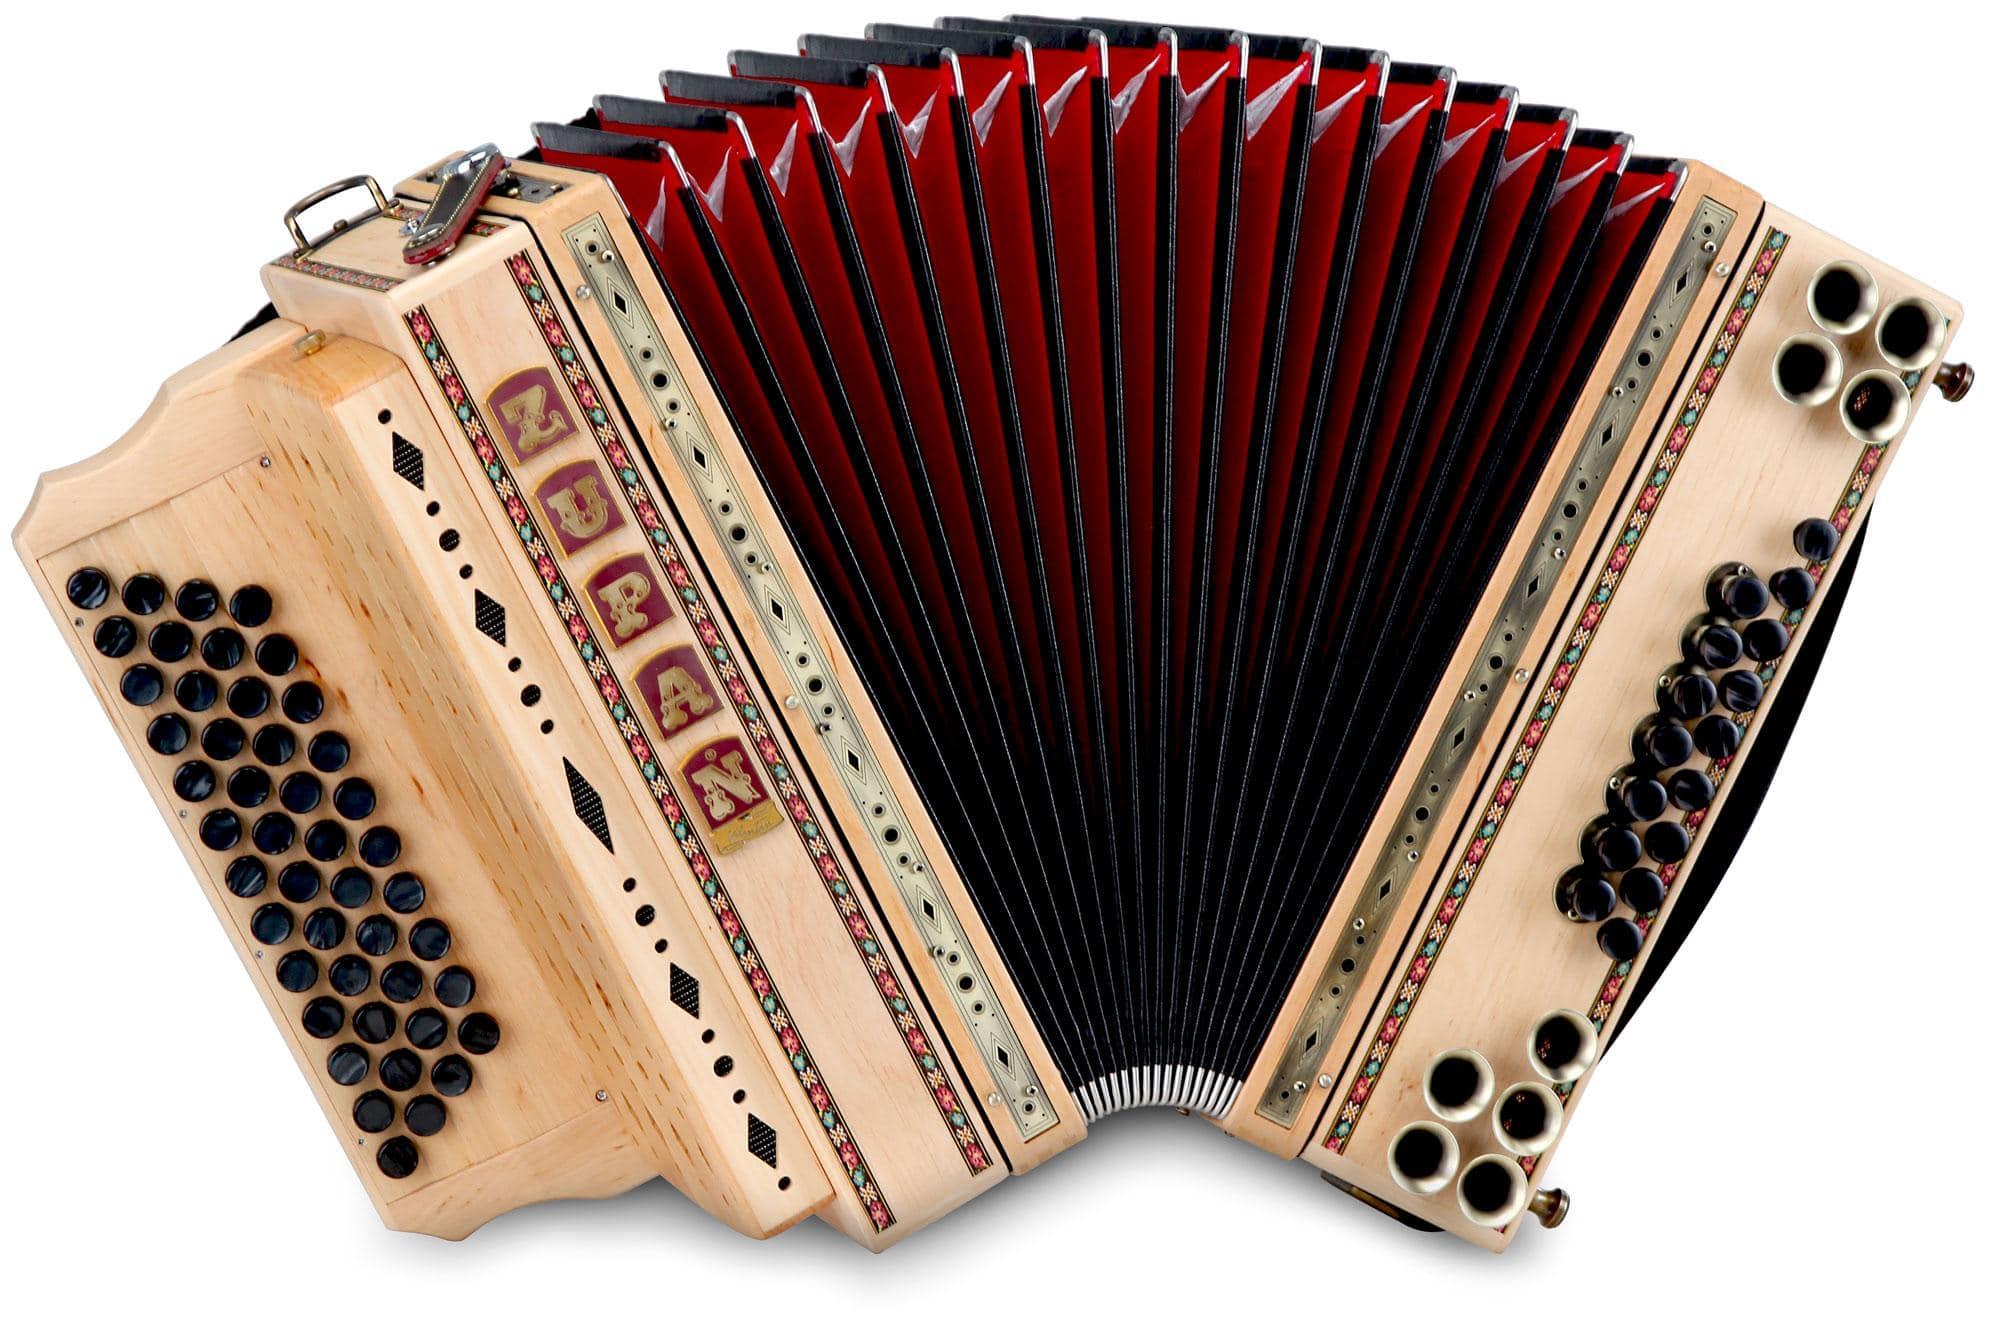 Zupan Eco 4 Iii Harmonika G C F B Erle